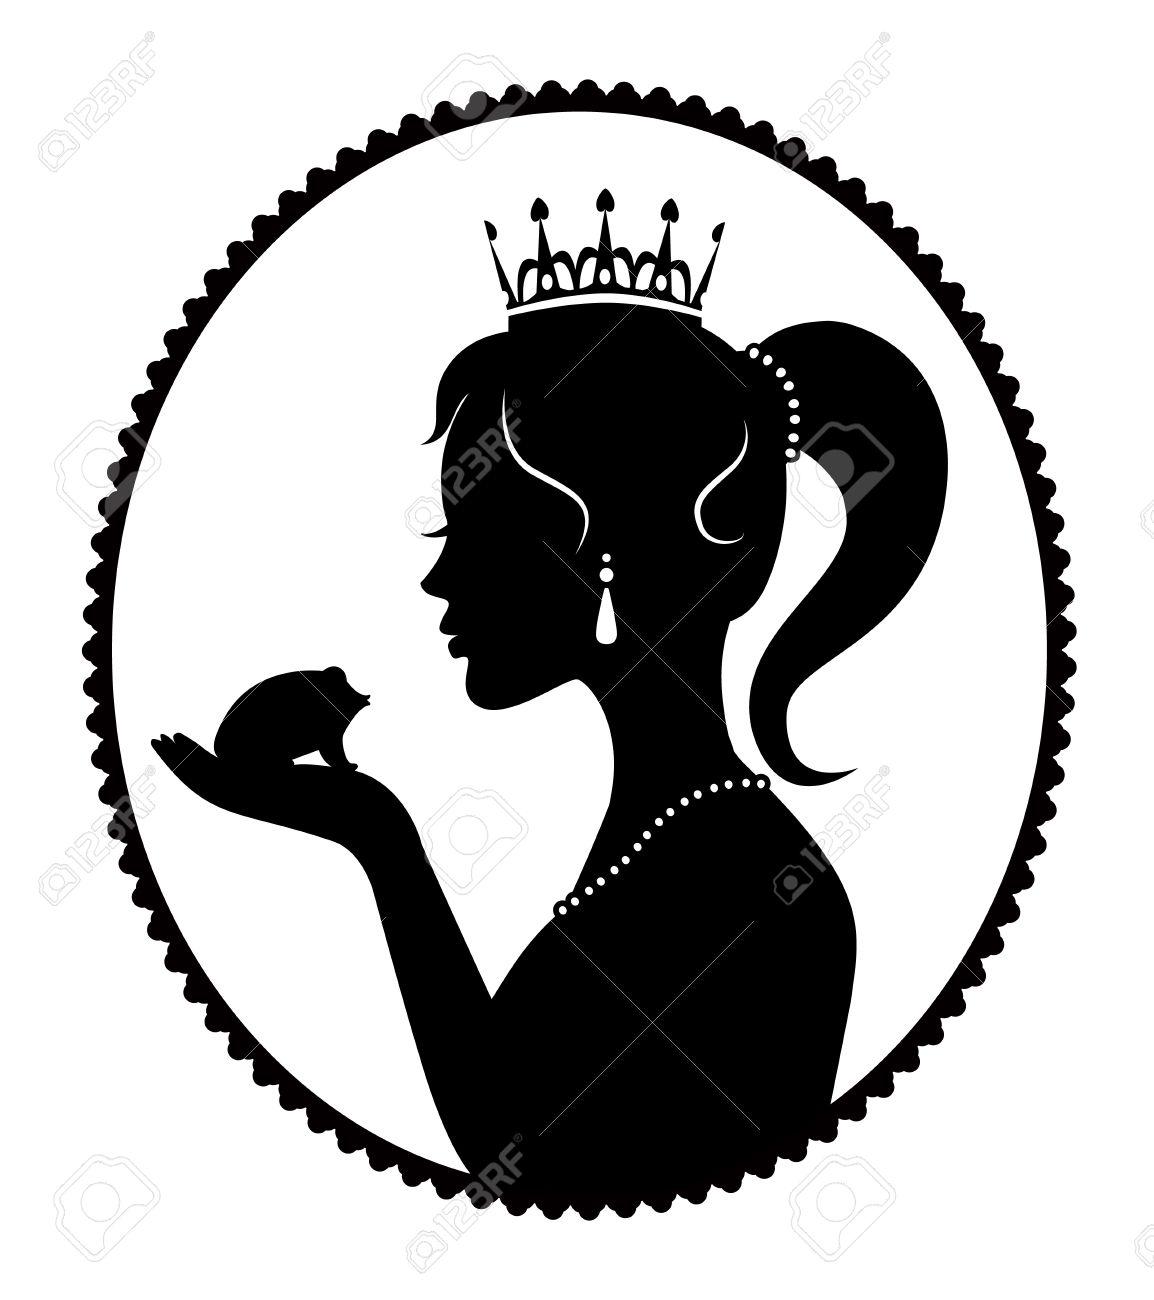 Princess crown silhouette clip art - photo#48